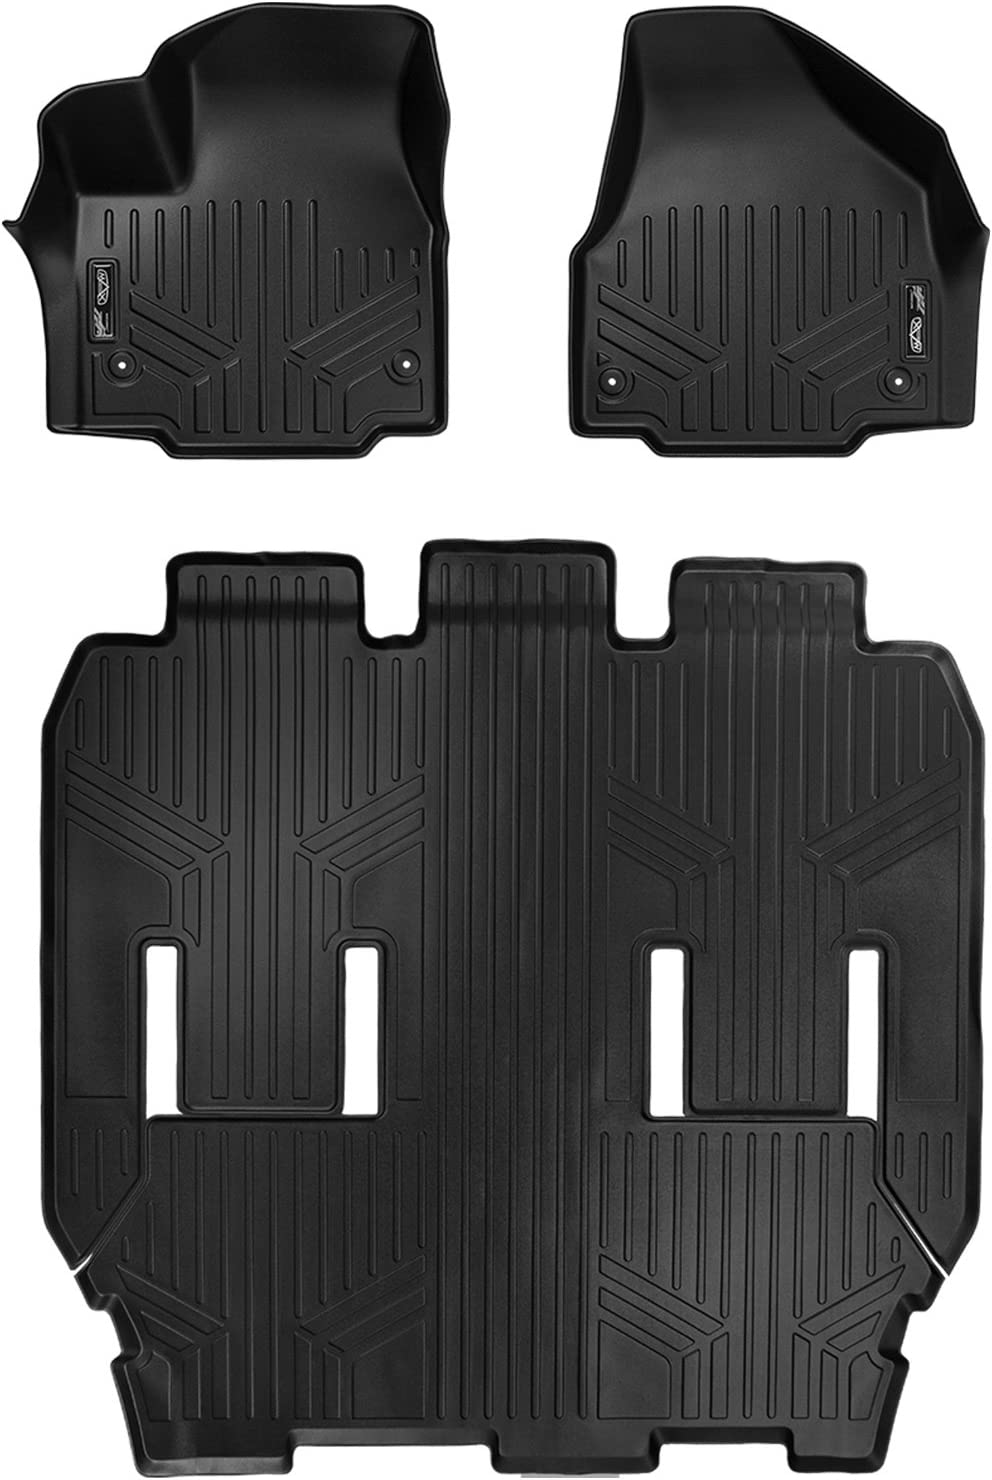 MAXFLOORMAT Floor Mats for Chrysler Pacifica 3 Rows Set 2017 Black